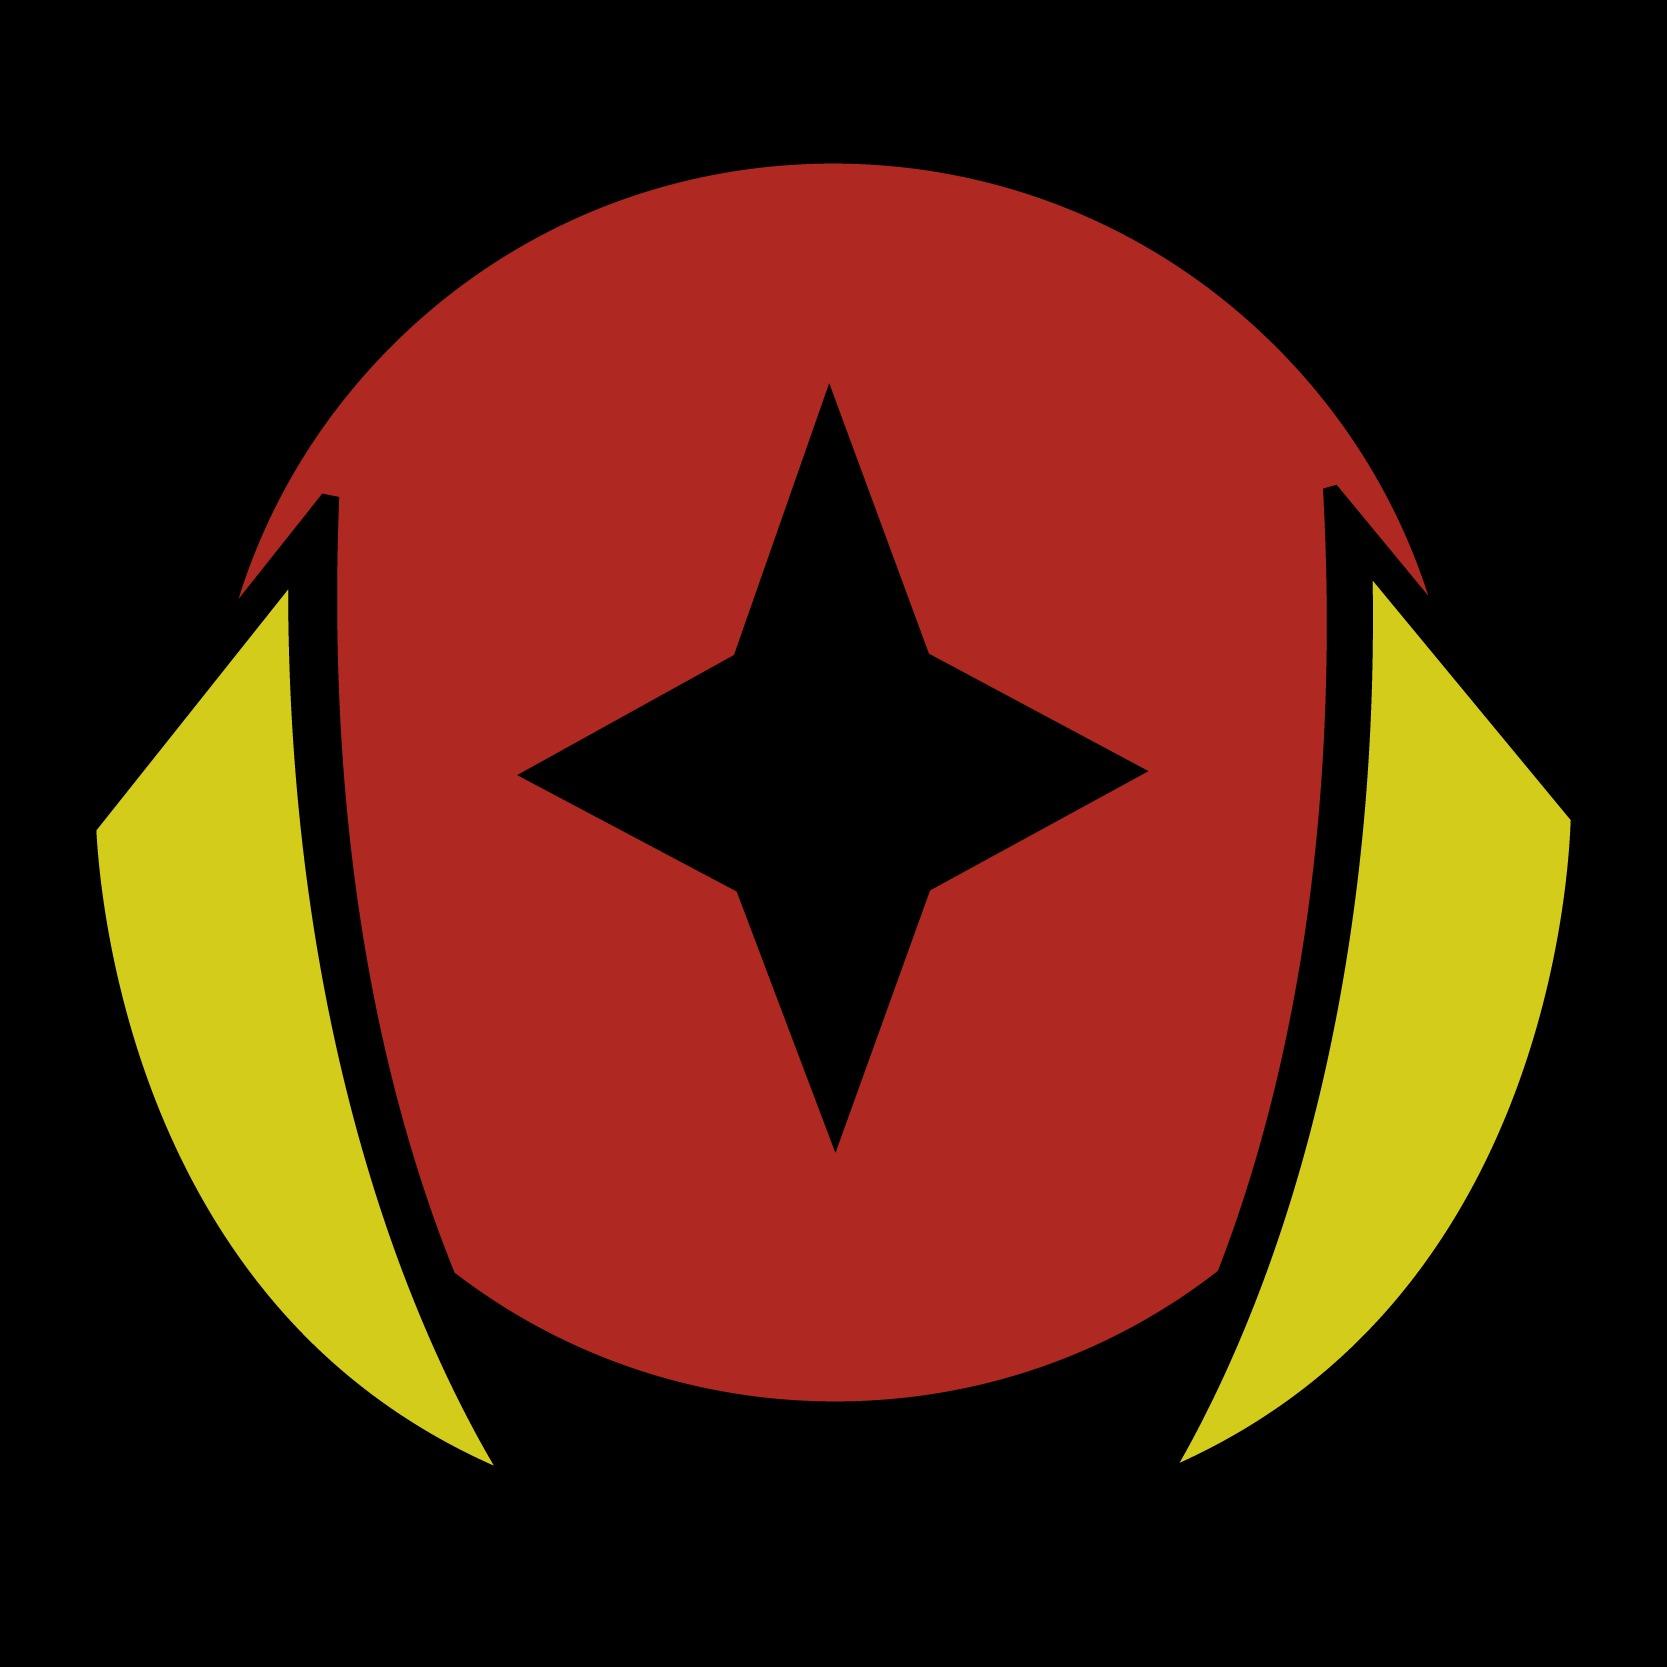 Tehga logo